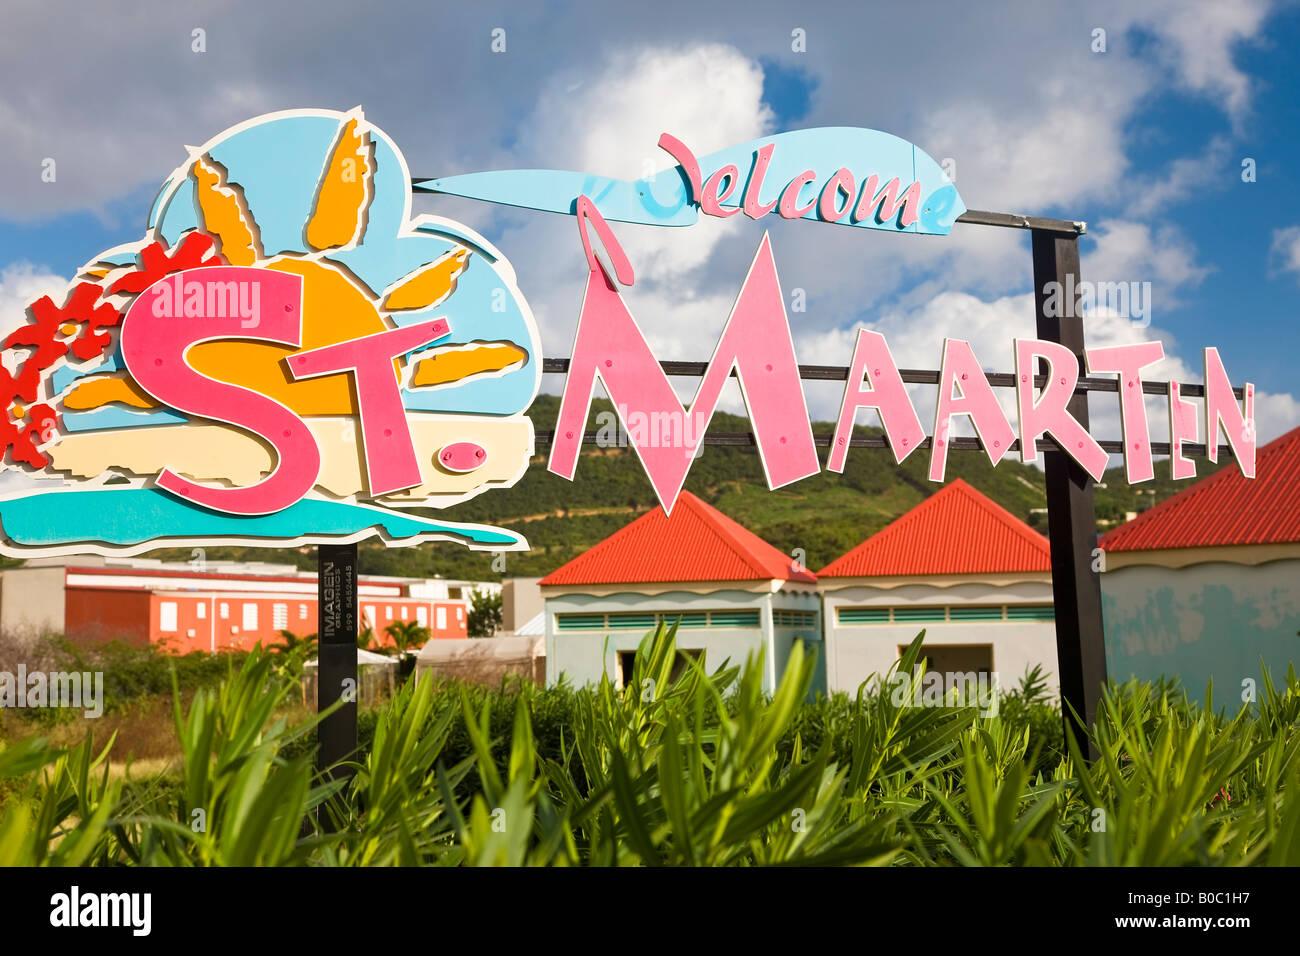 West Indies Caribbean Lesser Antilles Leeward Islands French West Indies Netherlands Antilles St Martin Saint Martin - Stock Image